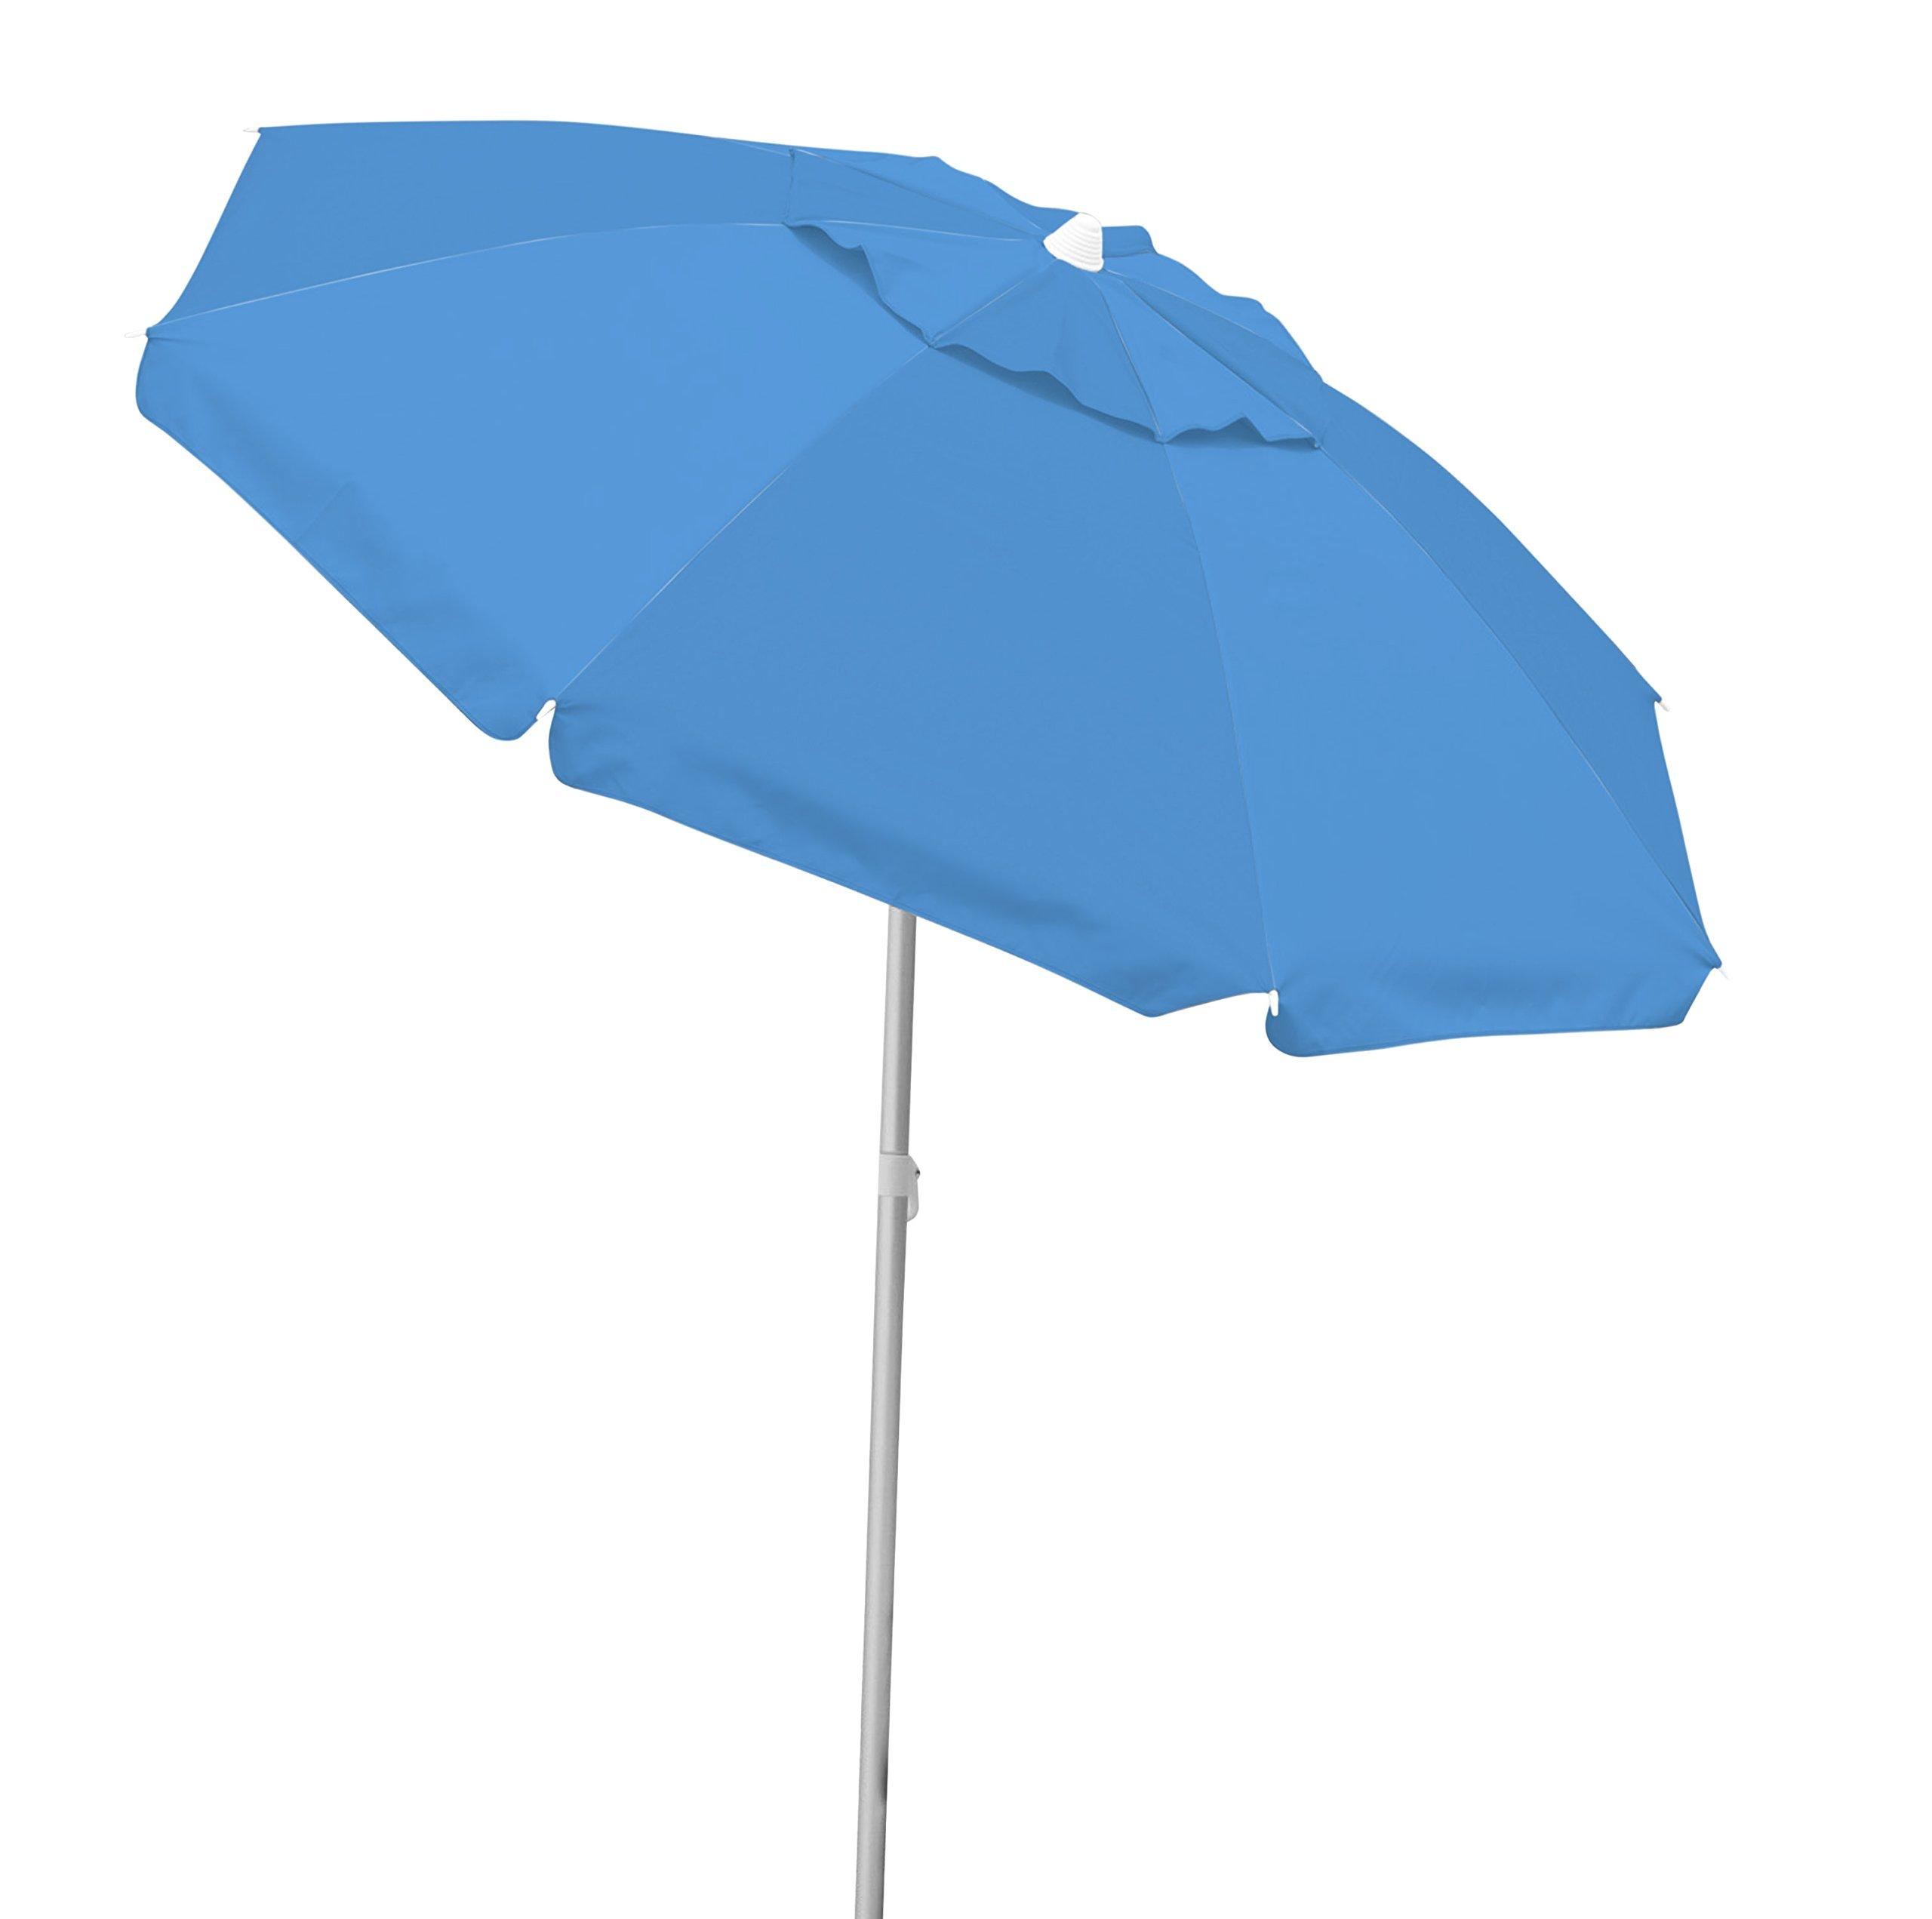 Caribbean Joe Tilting Beach Umbrella Double Canopy Windproof Design with UV Protection, Blue, 6.5' by Caribbean Joe